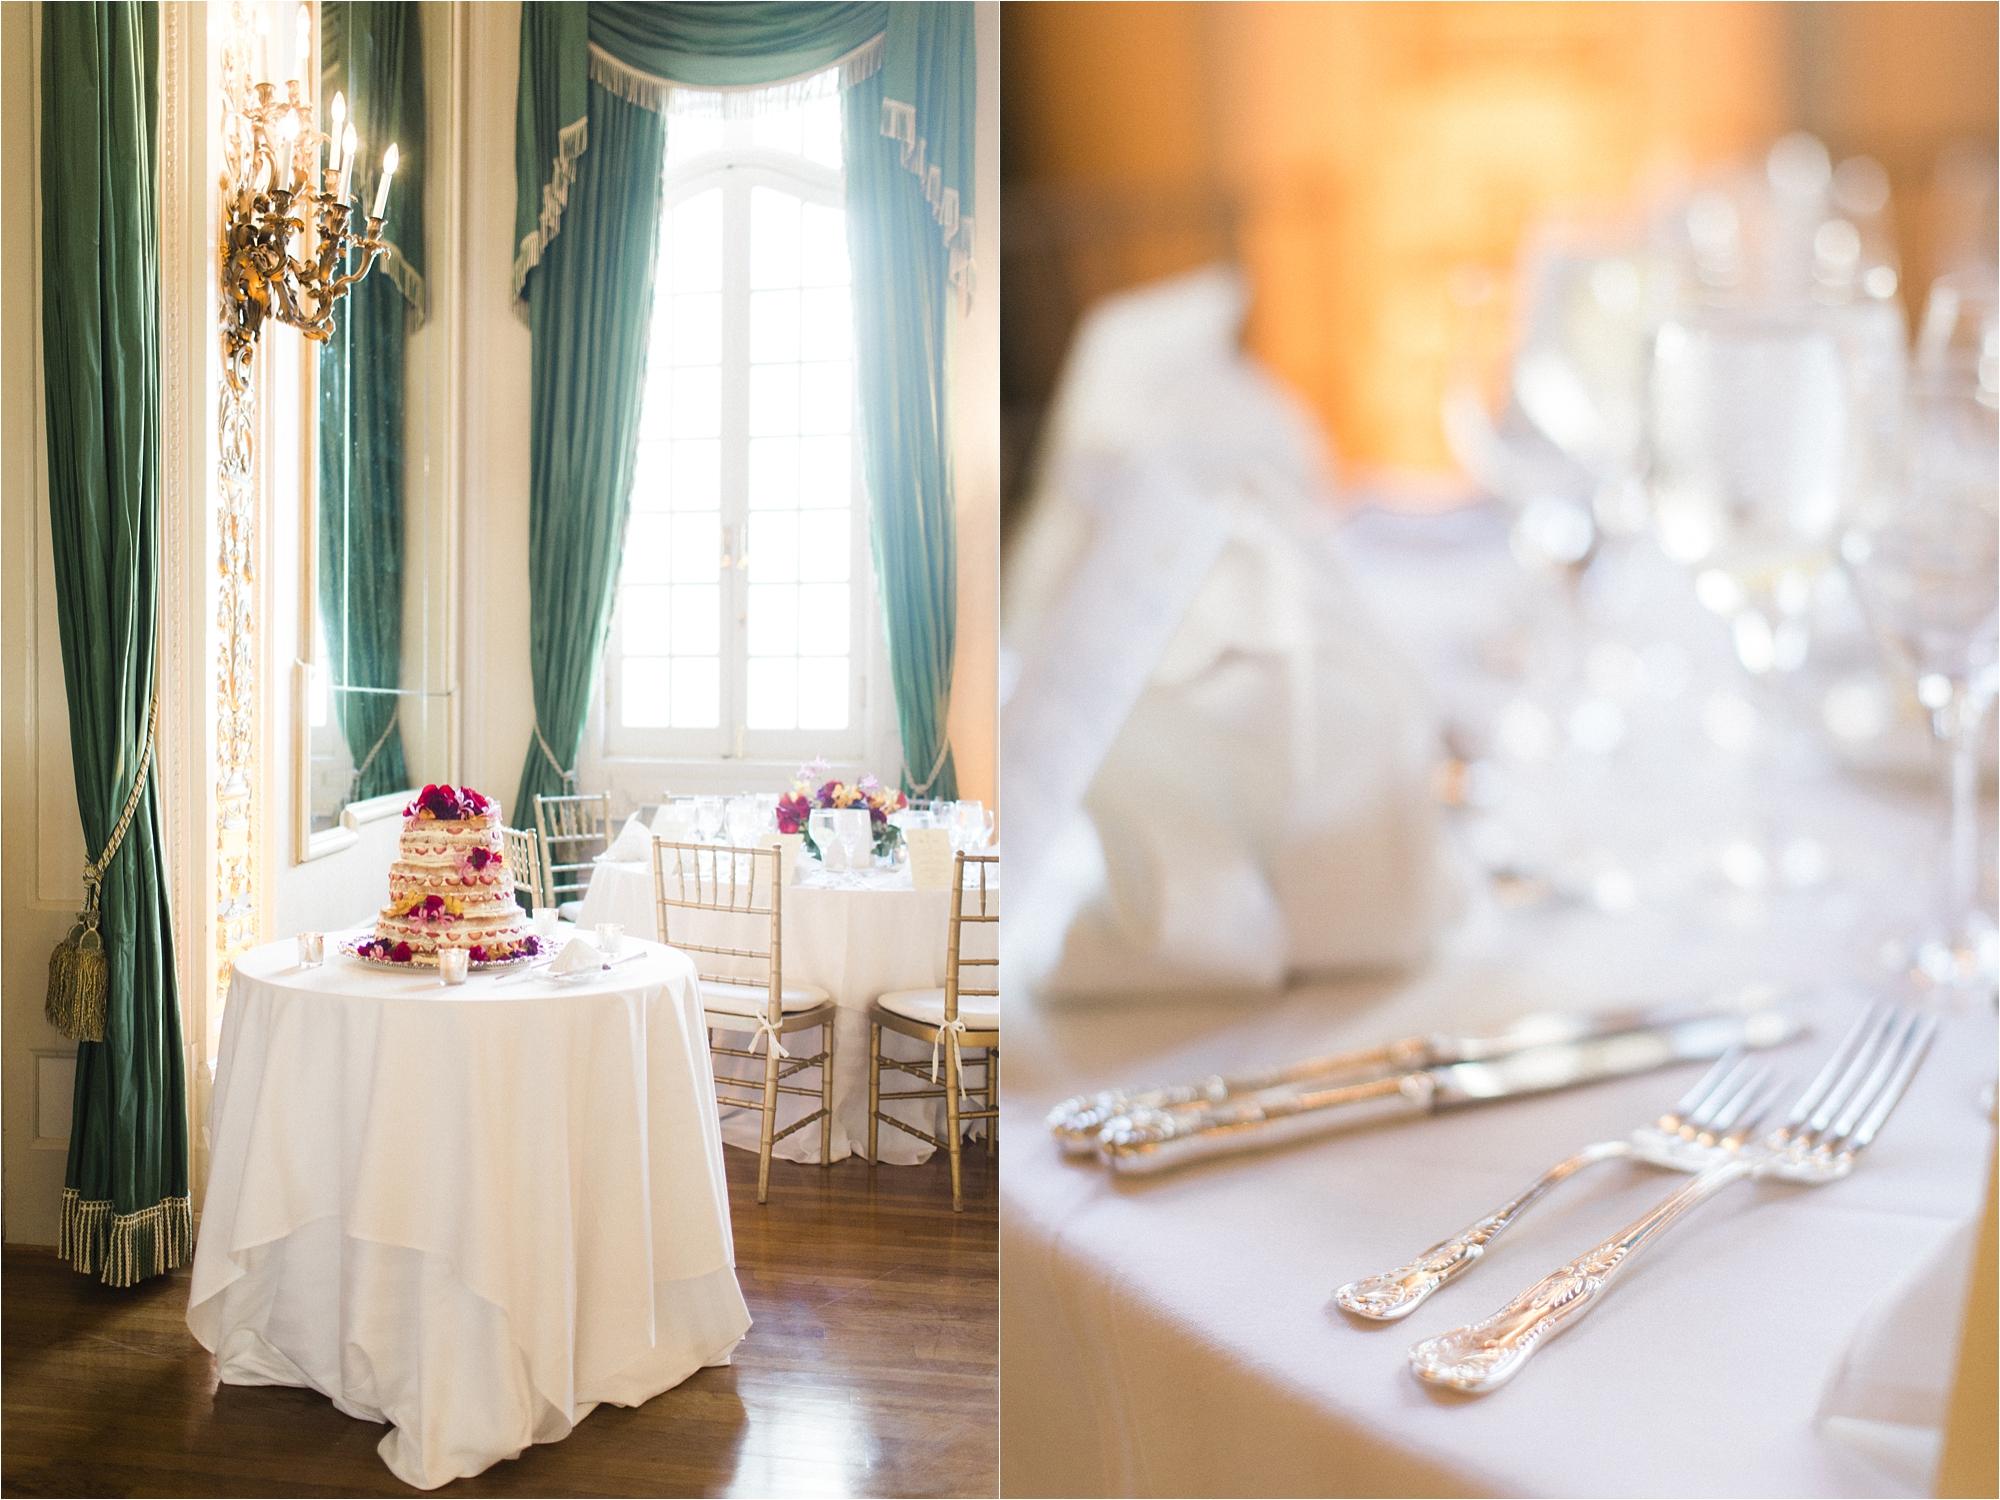 stephanie-yonce-photography-elegant-private-club-washington-dc-wedding-photos_0033.jpg